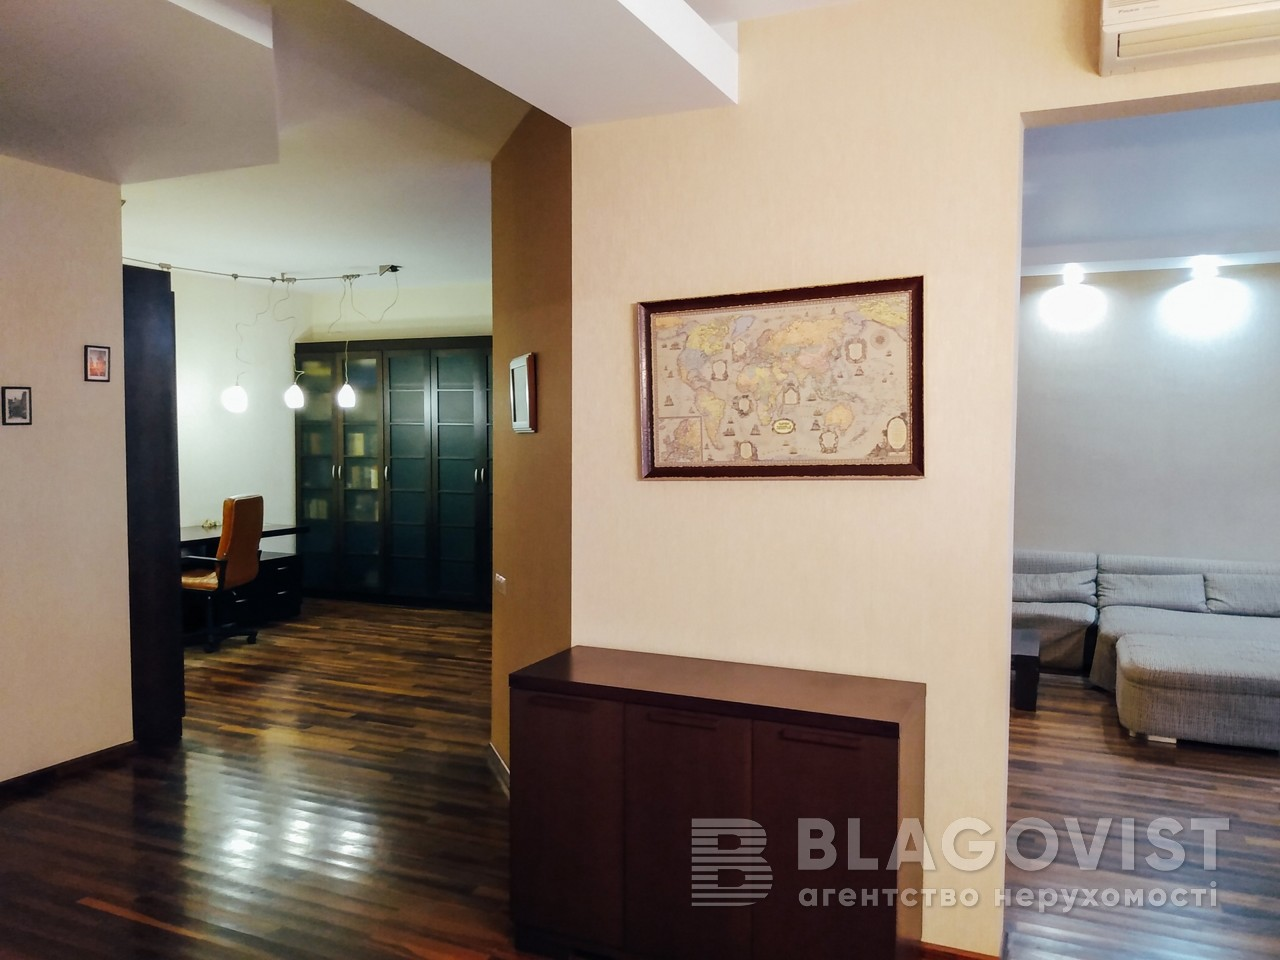 Квартира R-16873, Павловская, 17, Киев - Фото 52